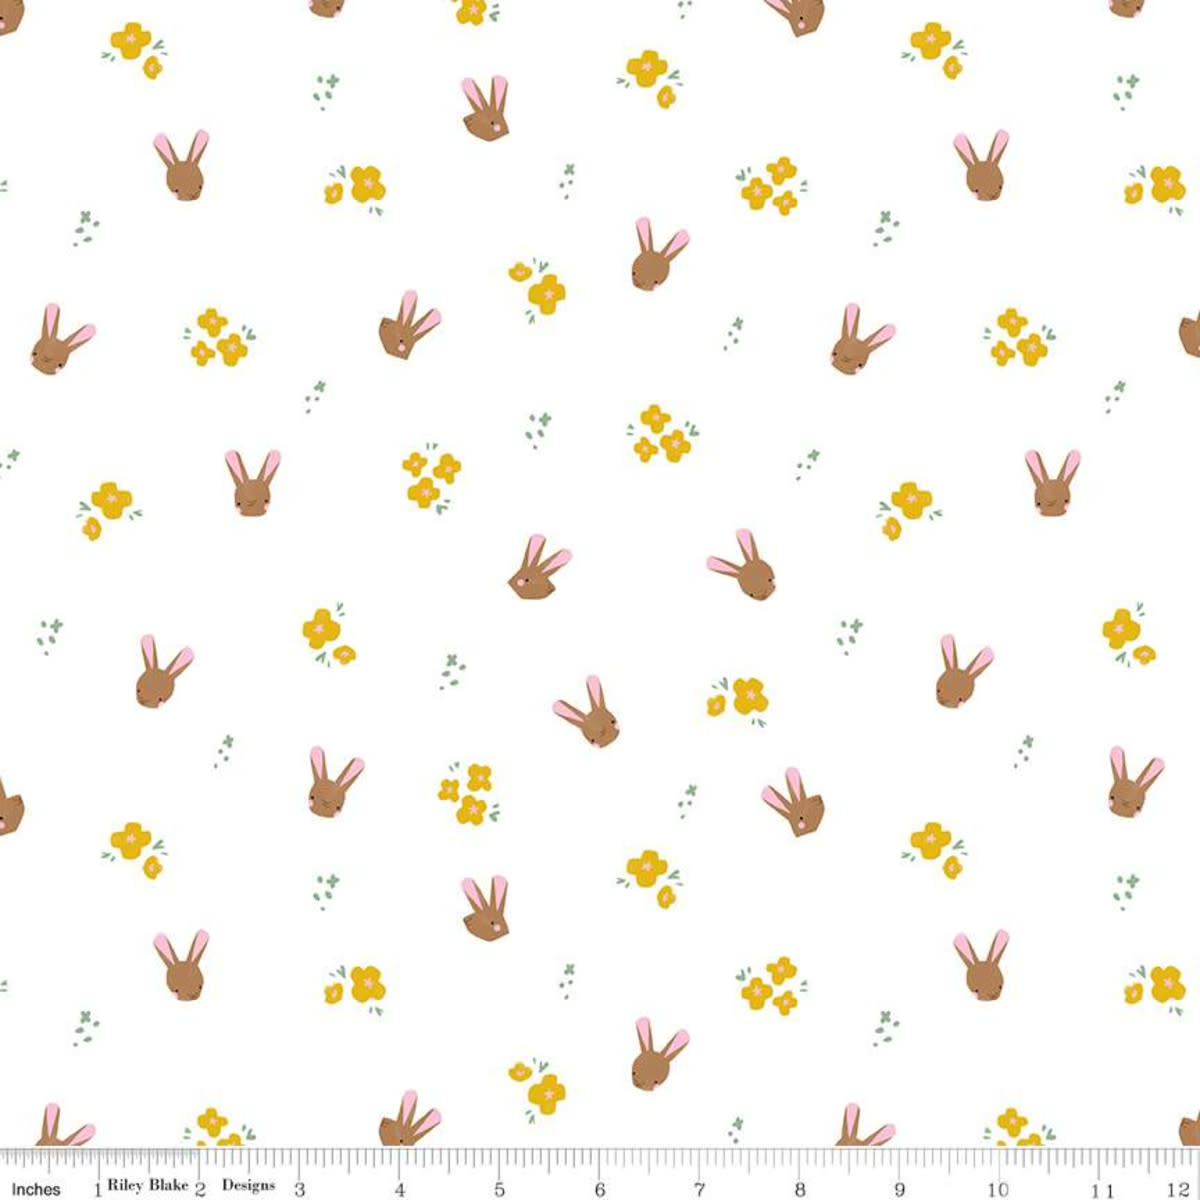 RILEY BLAKE DESIGNS Easter Egg Hunt, Bunnies, White $0.20 per cm or $20/m